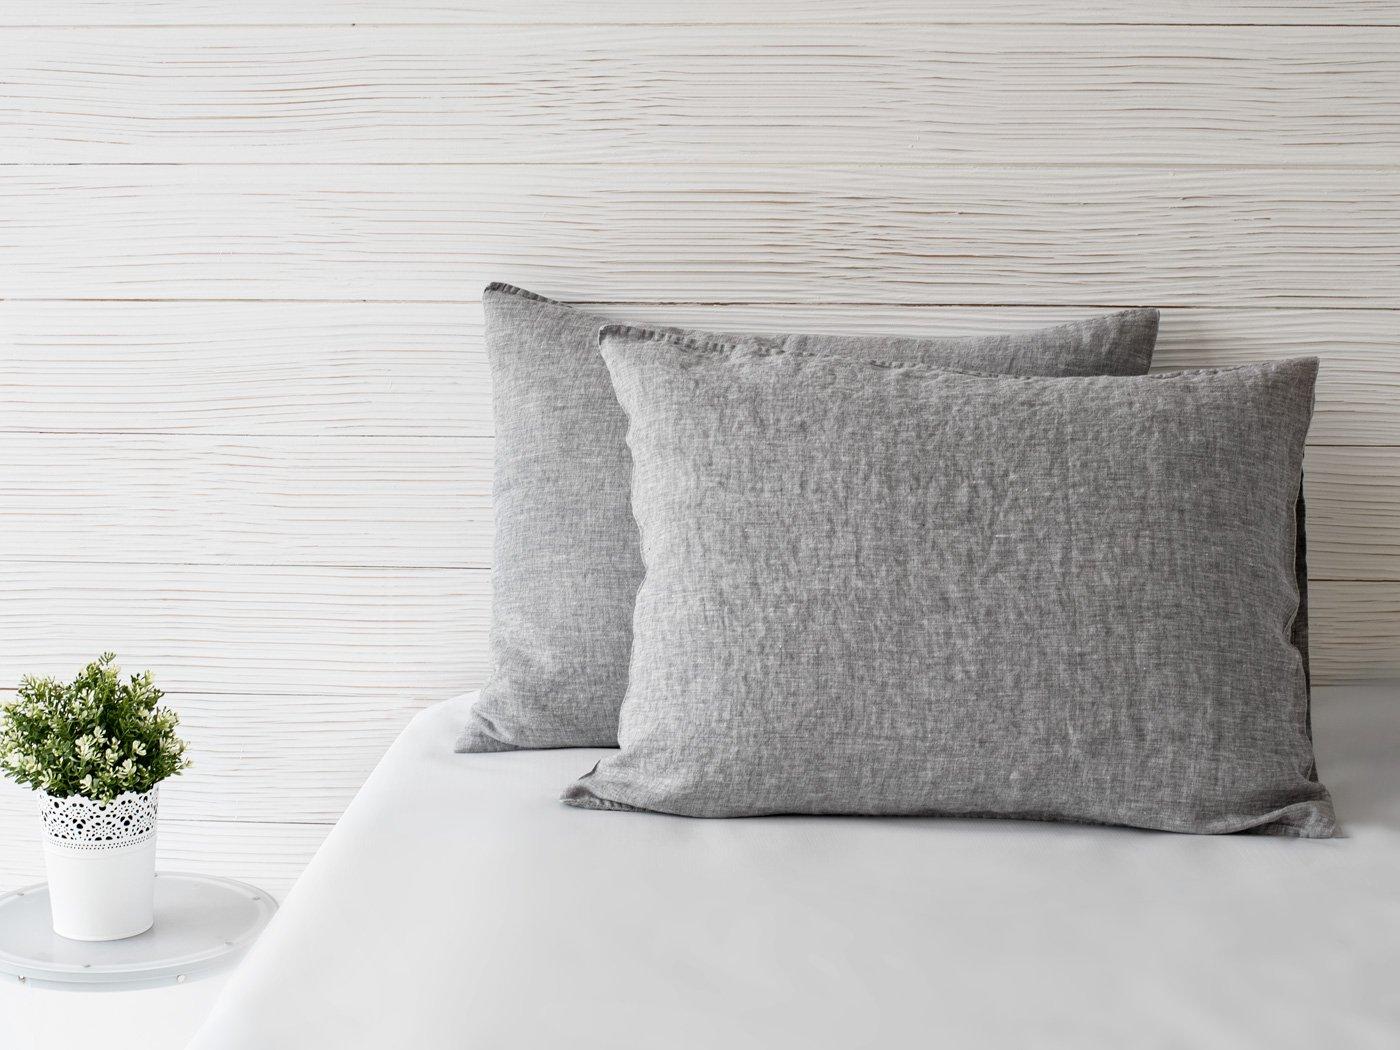 BEALINEN Linen Pillowcases Shams 2 pcs Inside Pocket Closure Size Standard 20x26 Ashen Gray Color Washed Softened European Linen